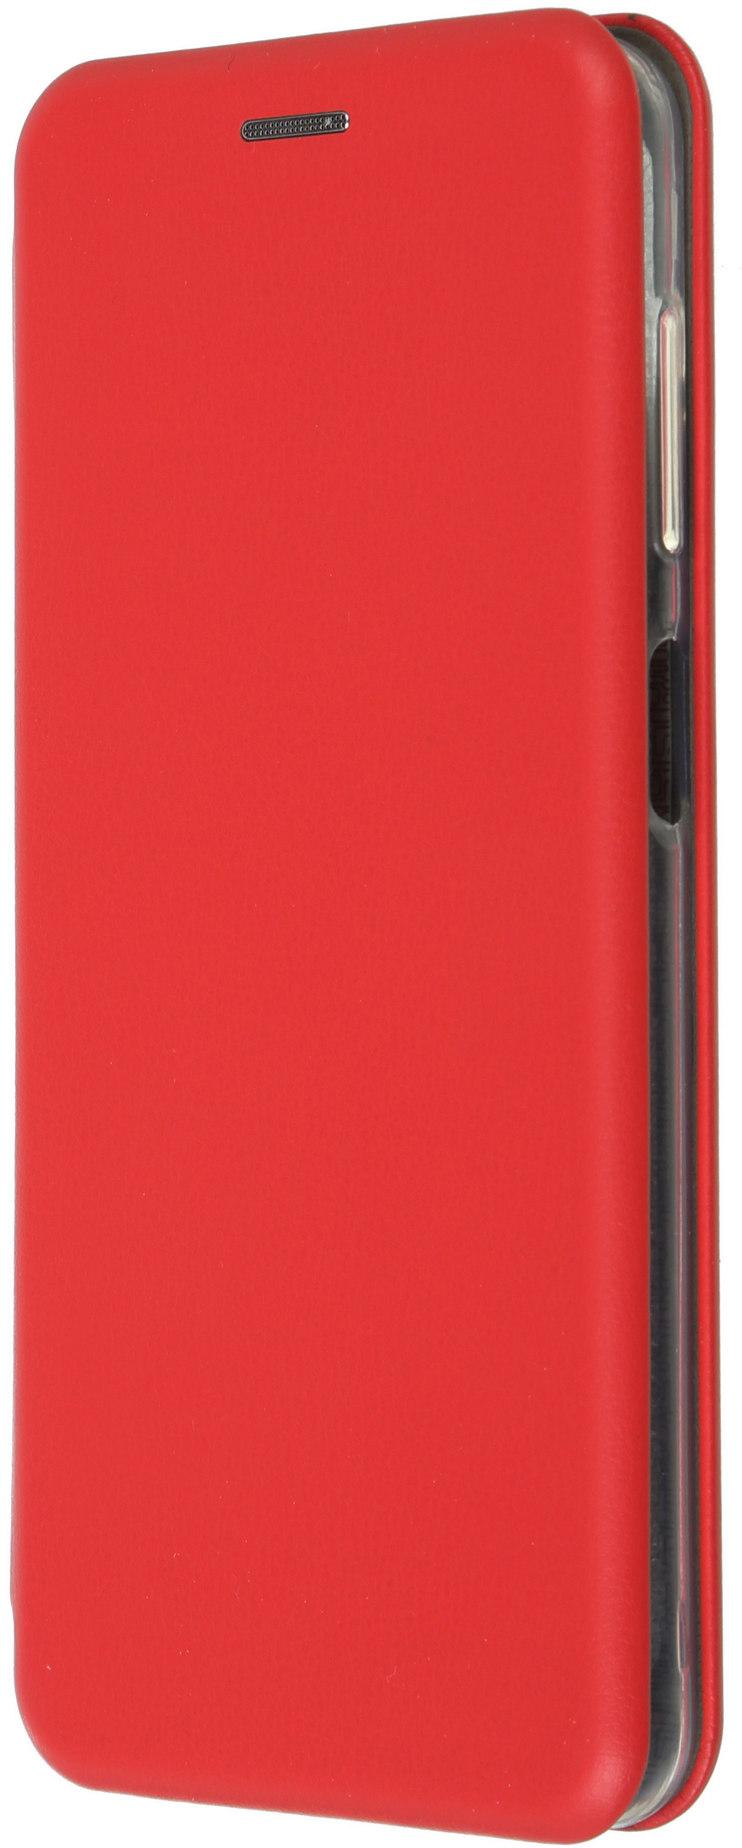 Чохол-книжка Armorstandart G-Case для Samsung Galaxy A12 / M12 / A12 Nacho Red